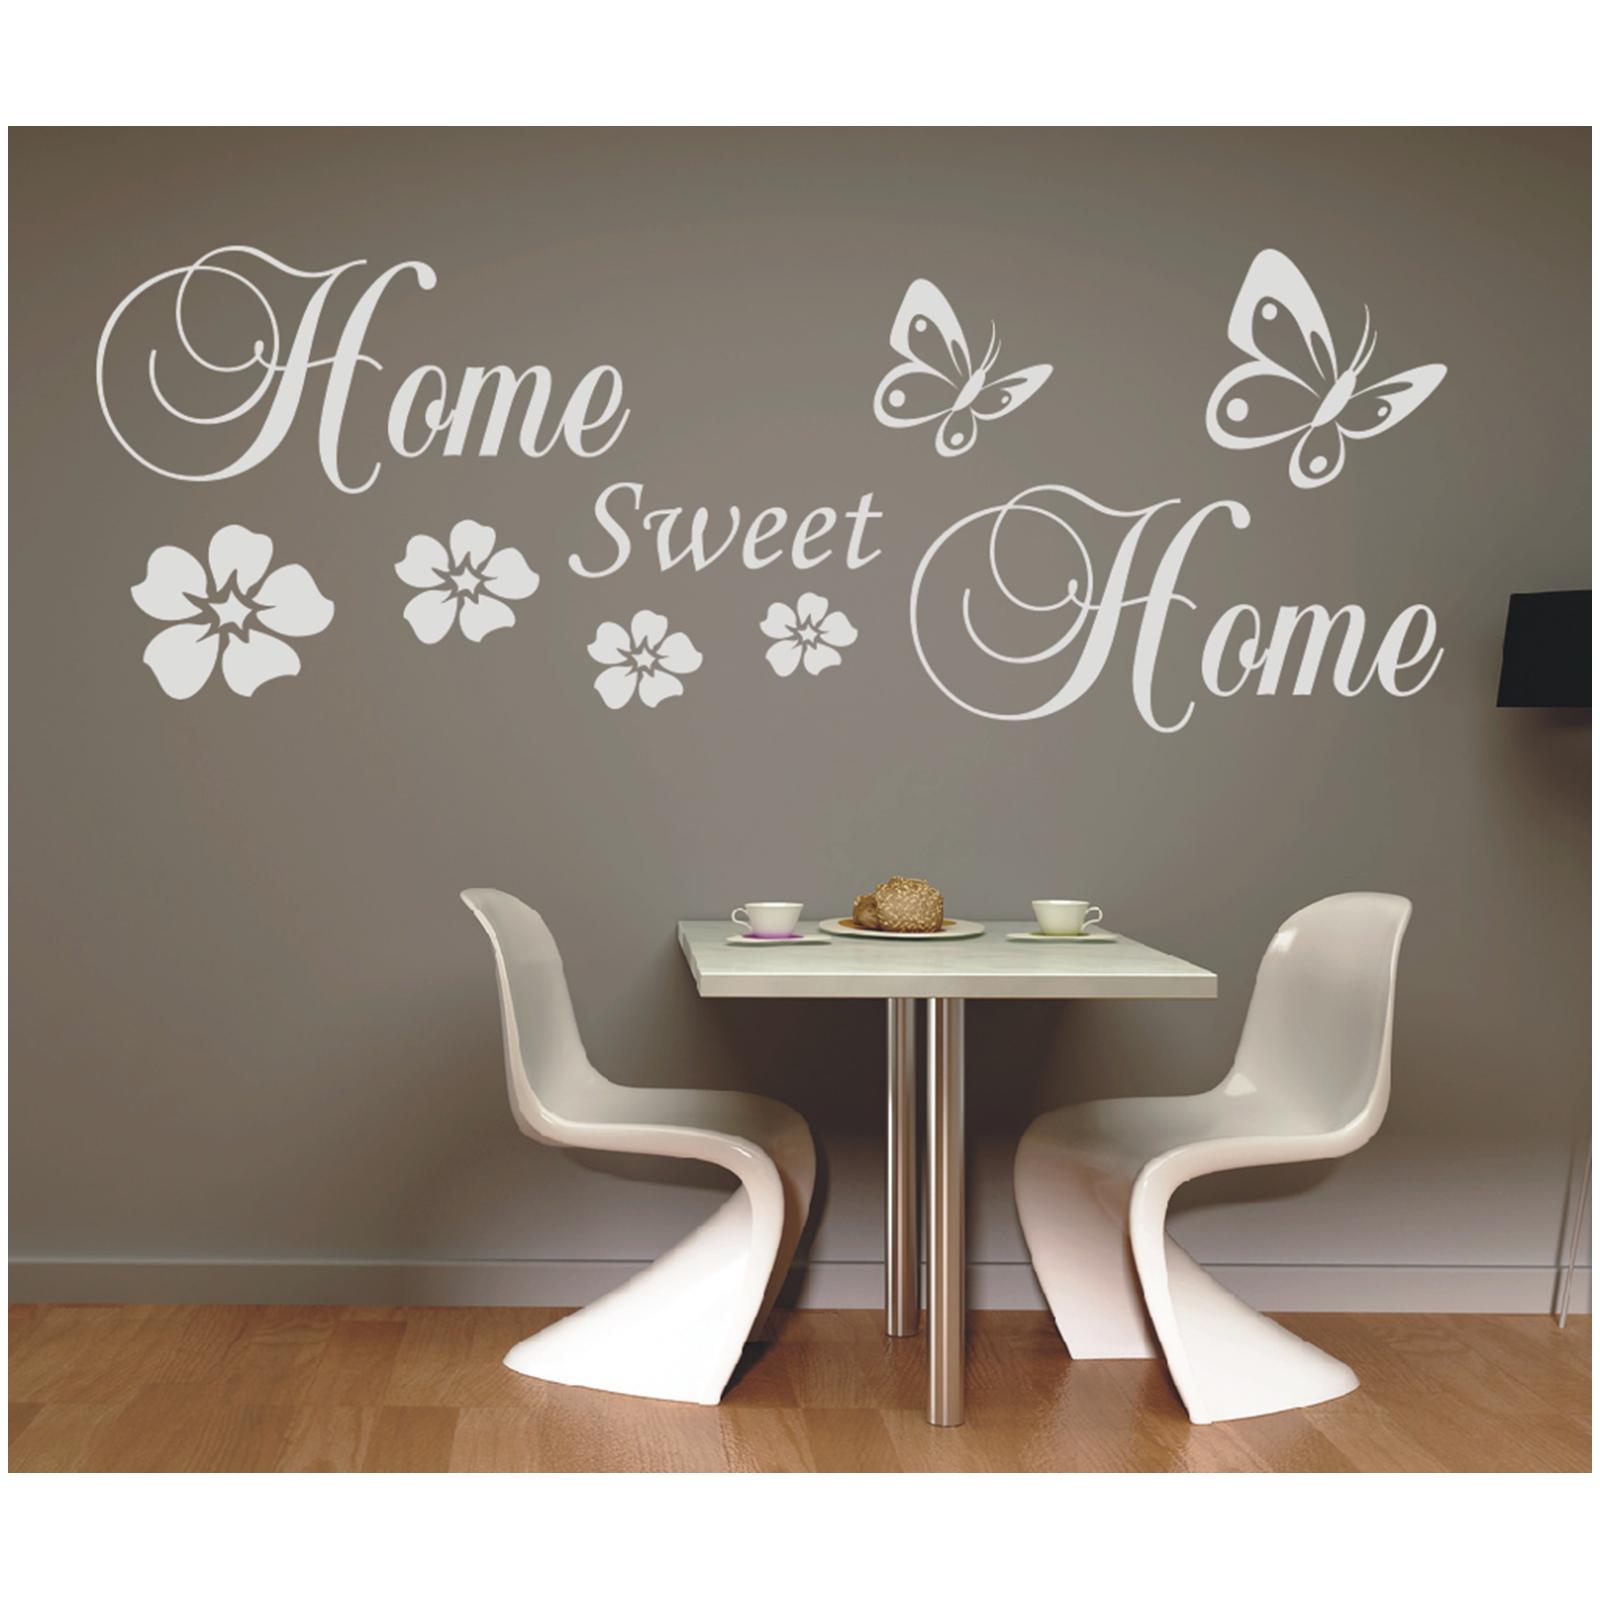 details zu wandtattoo spruch home sweet home zuhause wandsticker sticker wandaufkleber 5